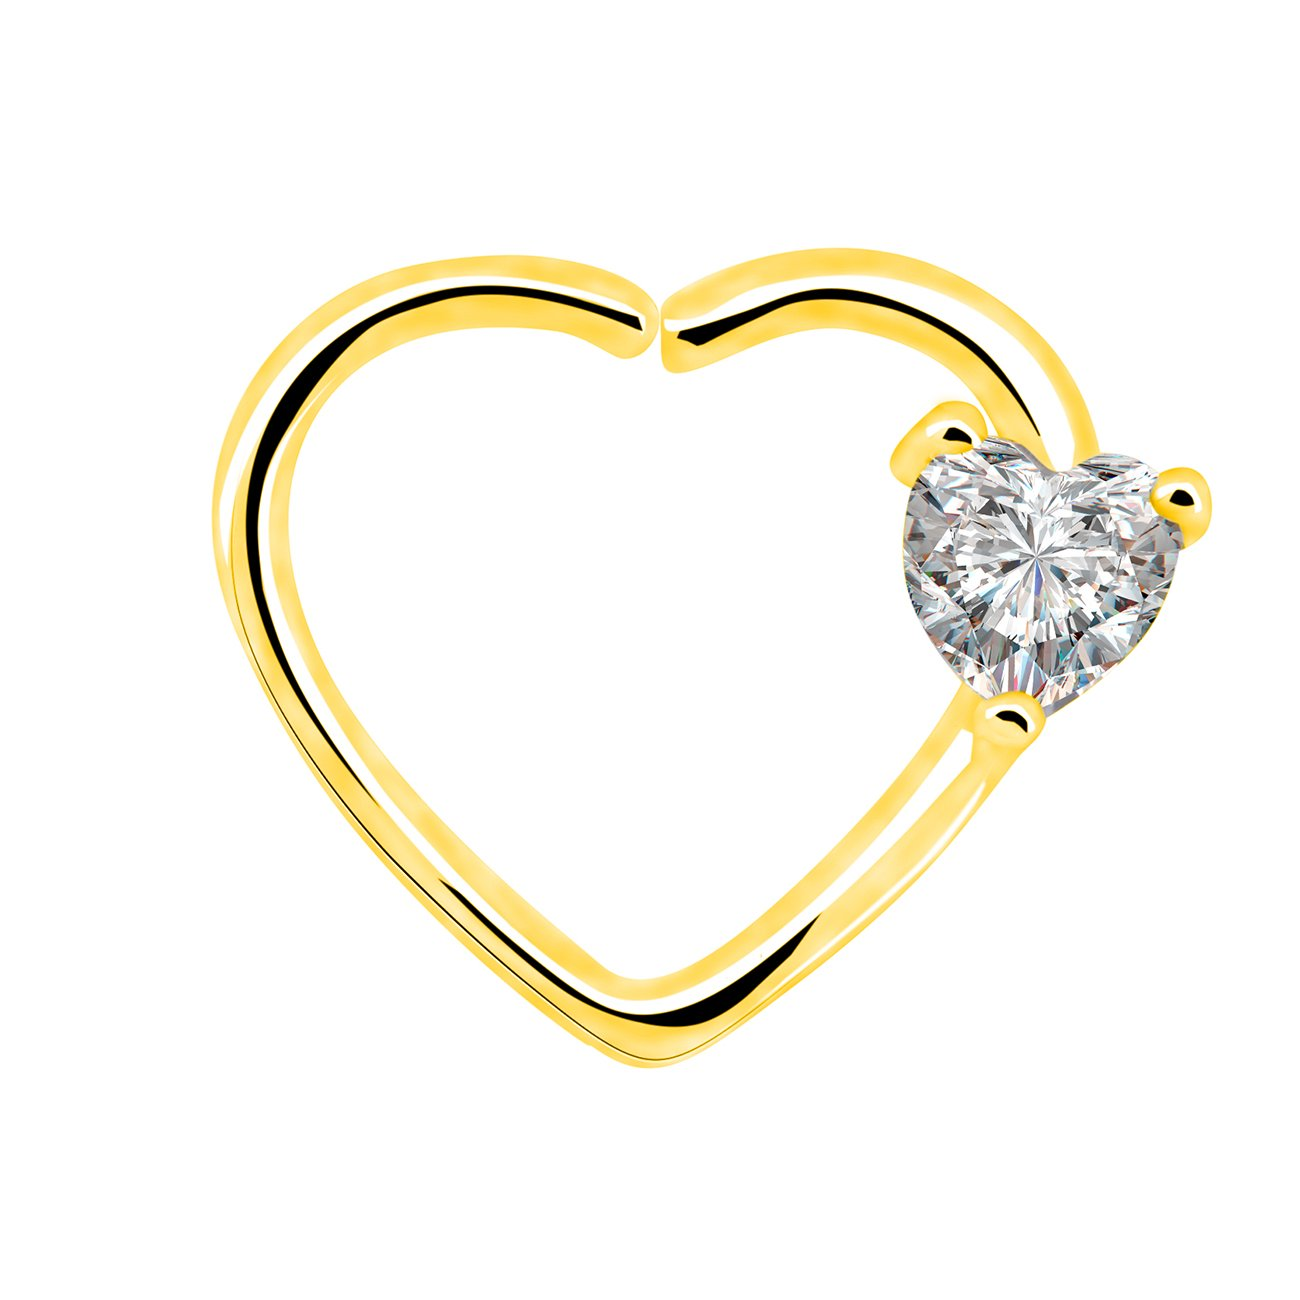 ce72d2318 Amazon.com: OUFER Body Piercing Jewelry 16 Gauge Clear Heart CZ Left  Closure Daith Cartilage Earring Heart Tragus Earrings Piercing (Gold  Clear): Jewelry